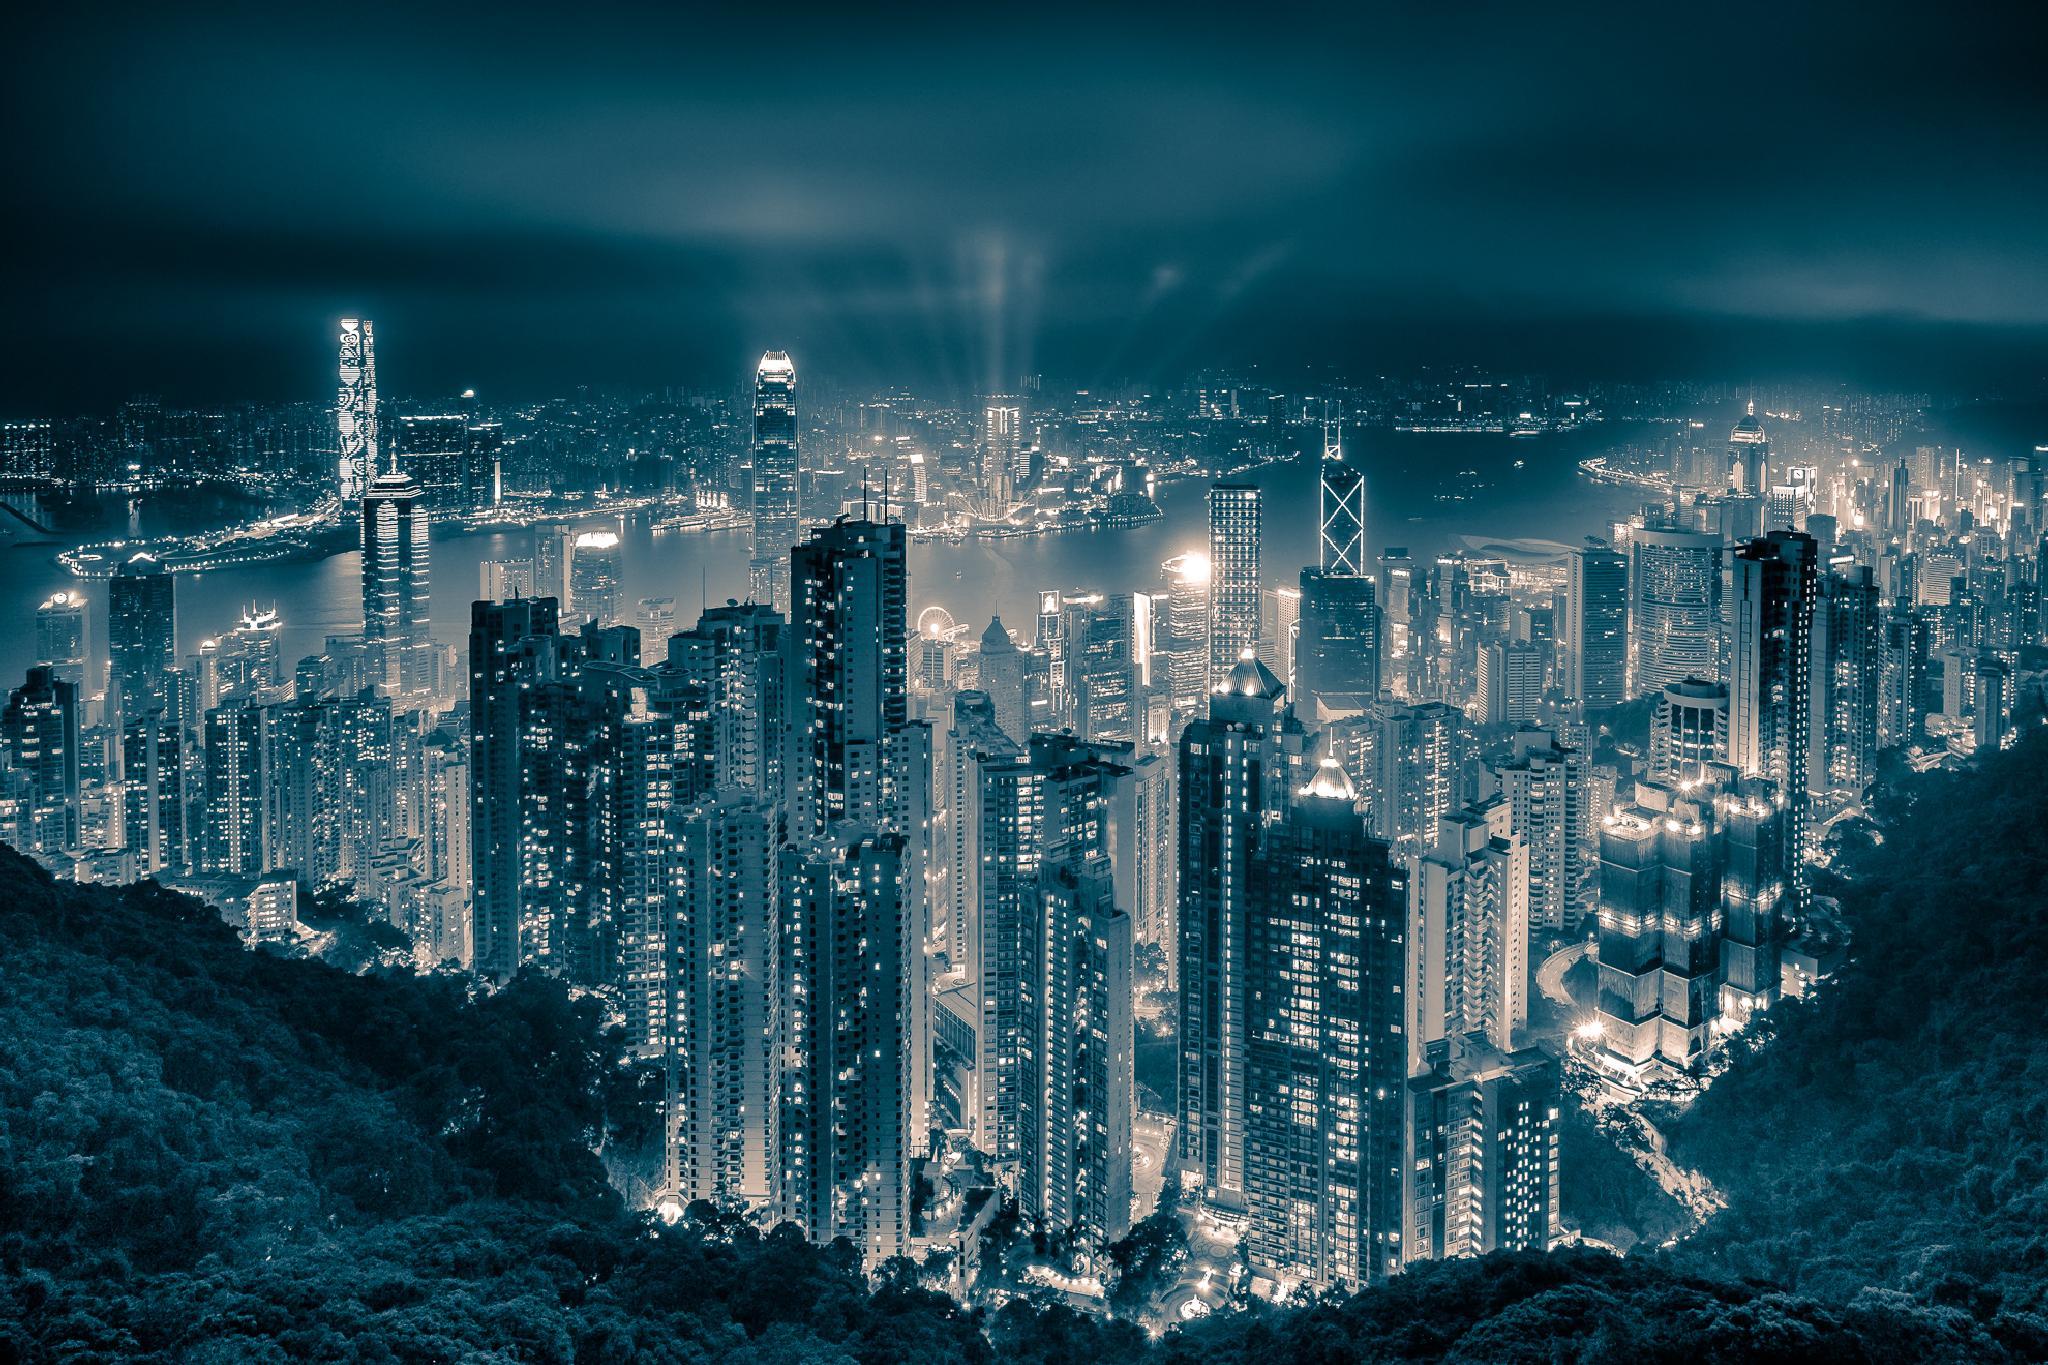 Urban GLow by Obyphotography